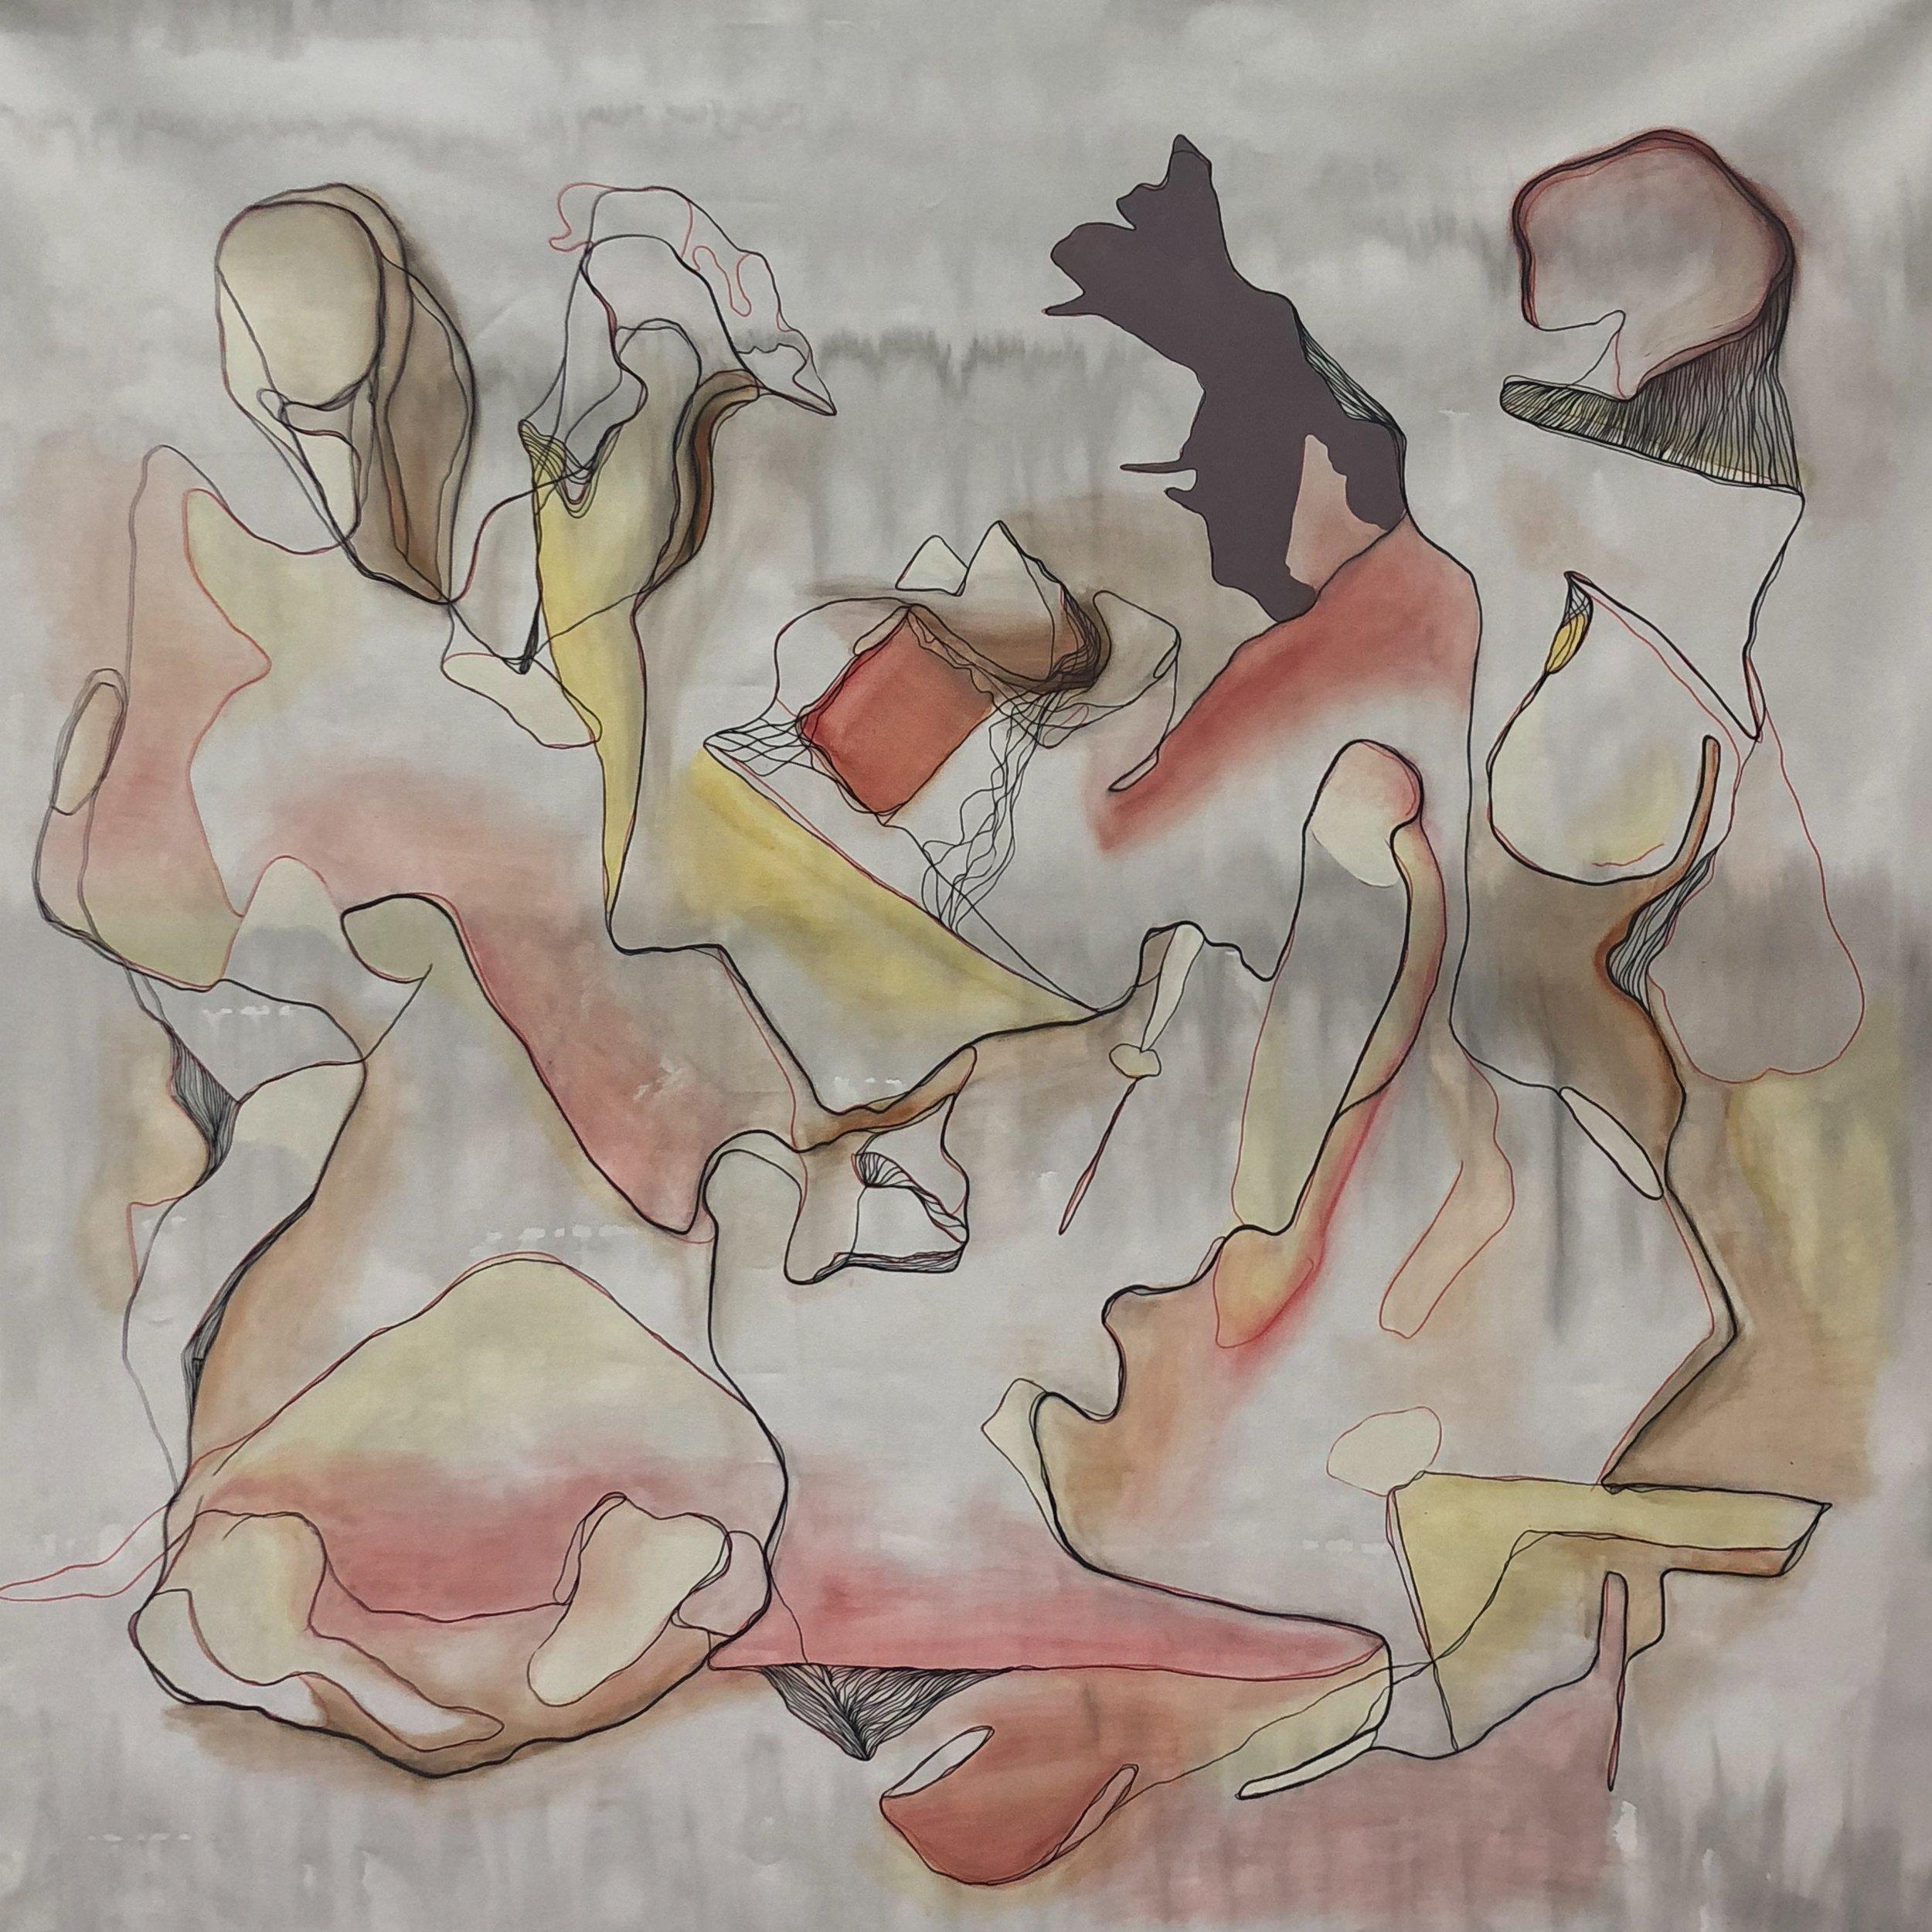 Amanda Maciel Antunes  Last Time I Saw You More Than Three Centuries Ago , 2018 Acrylic and pastel on canvas 152.4 x 152.4 cm 60 x 60 in Photo: Copyright Amanda Maciel Antunes Courtesy of the Artist